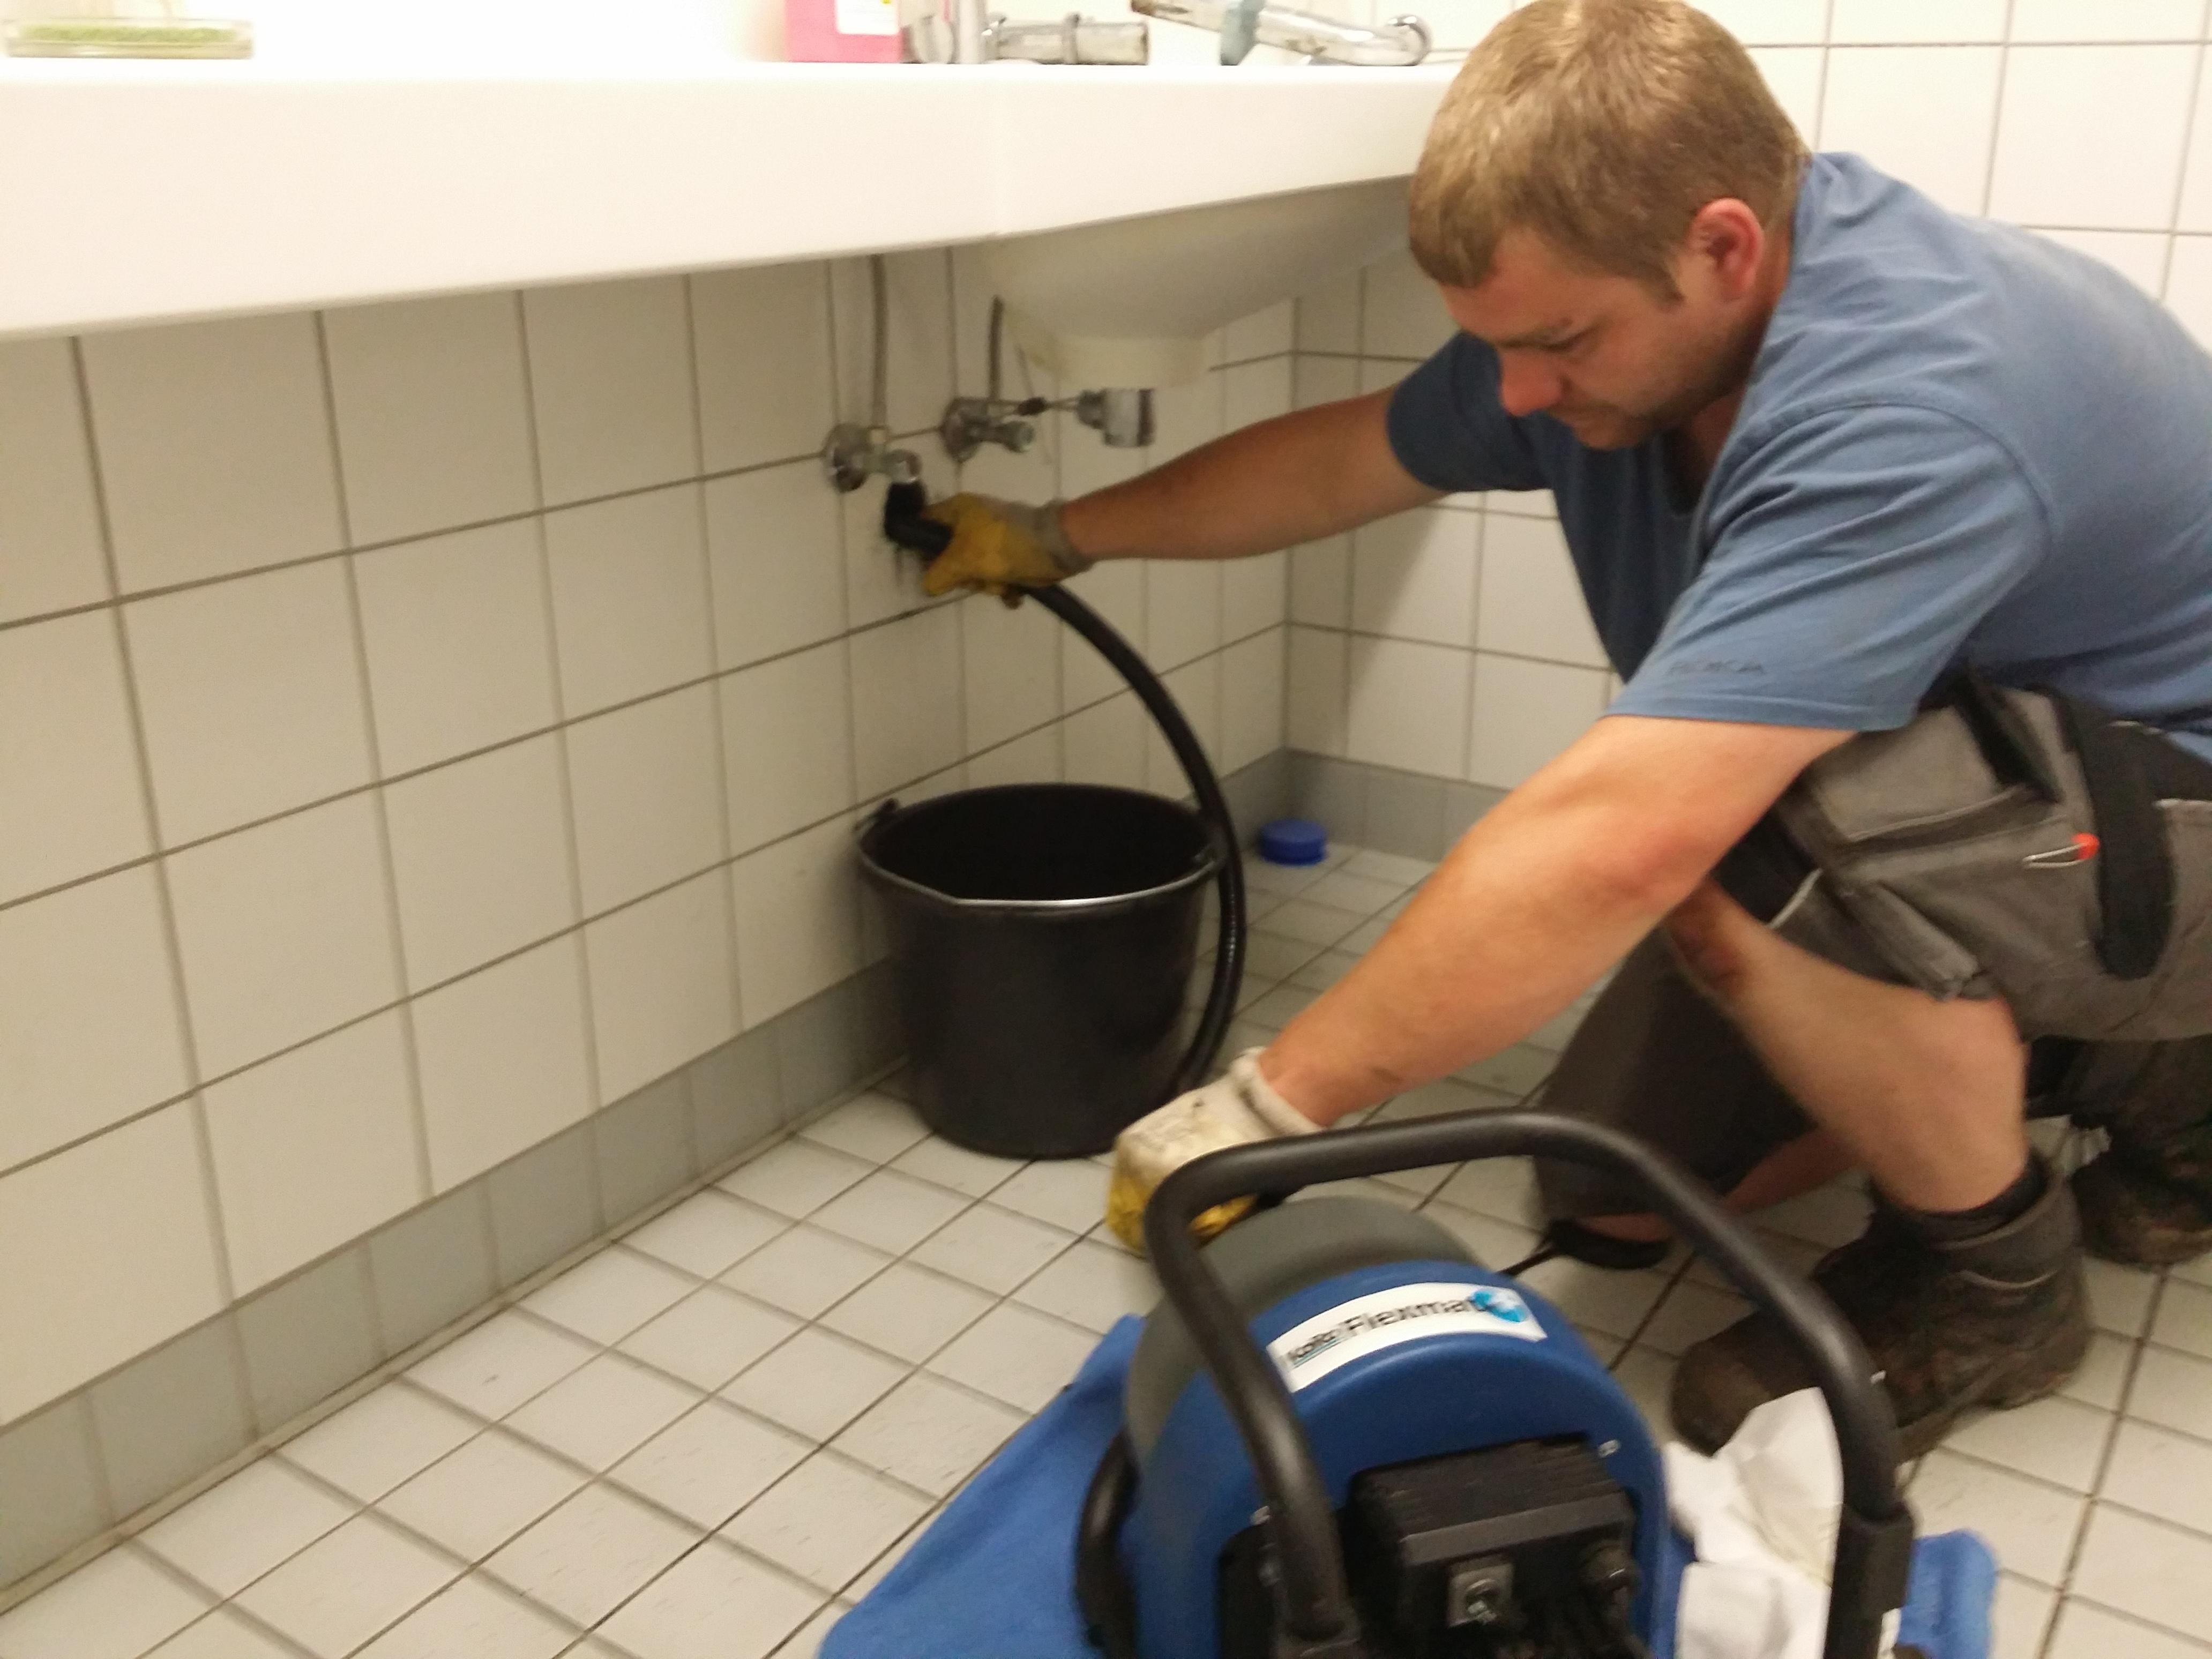 Waschbecken verstopft